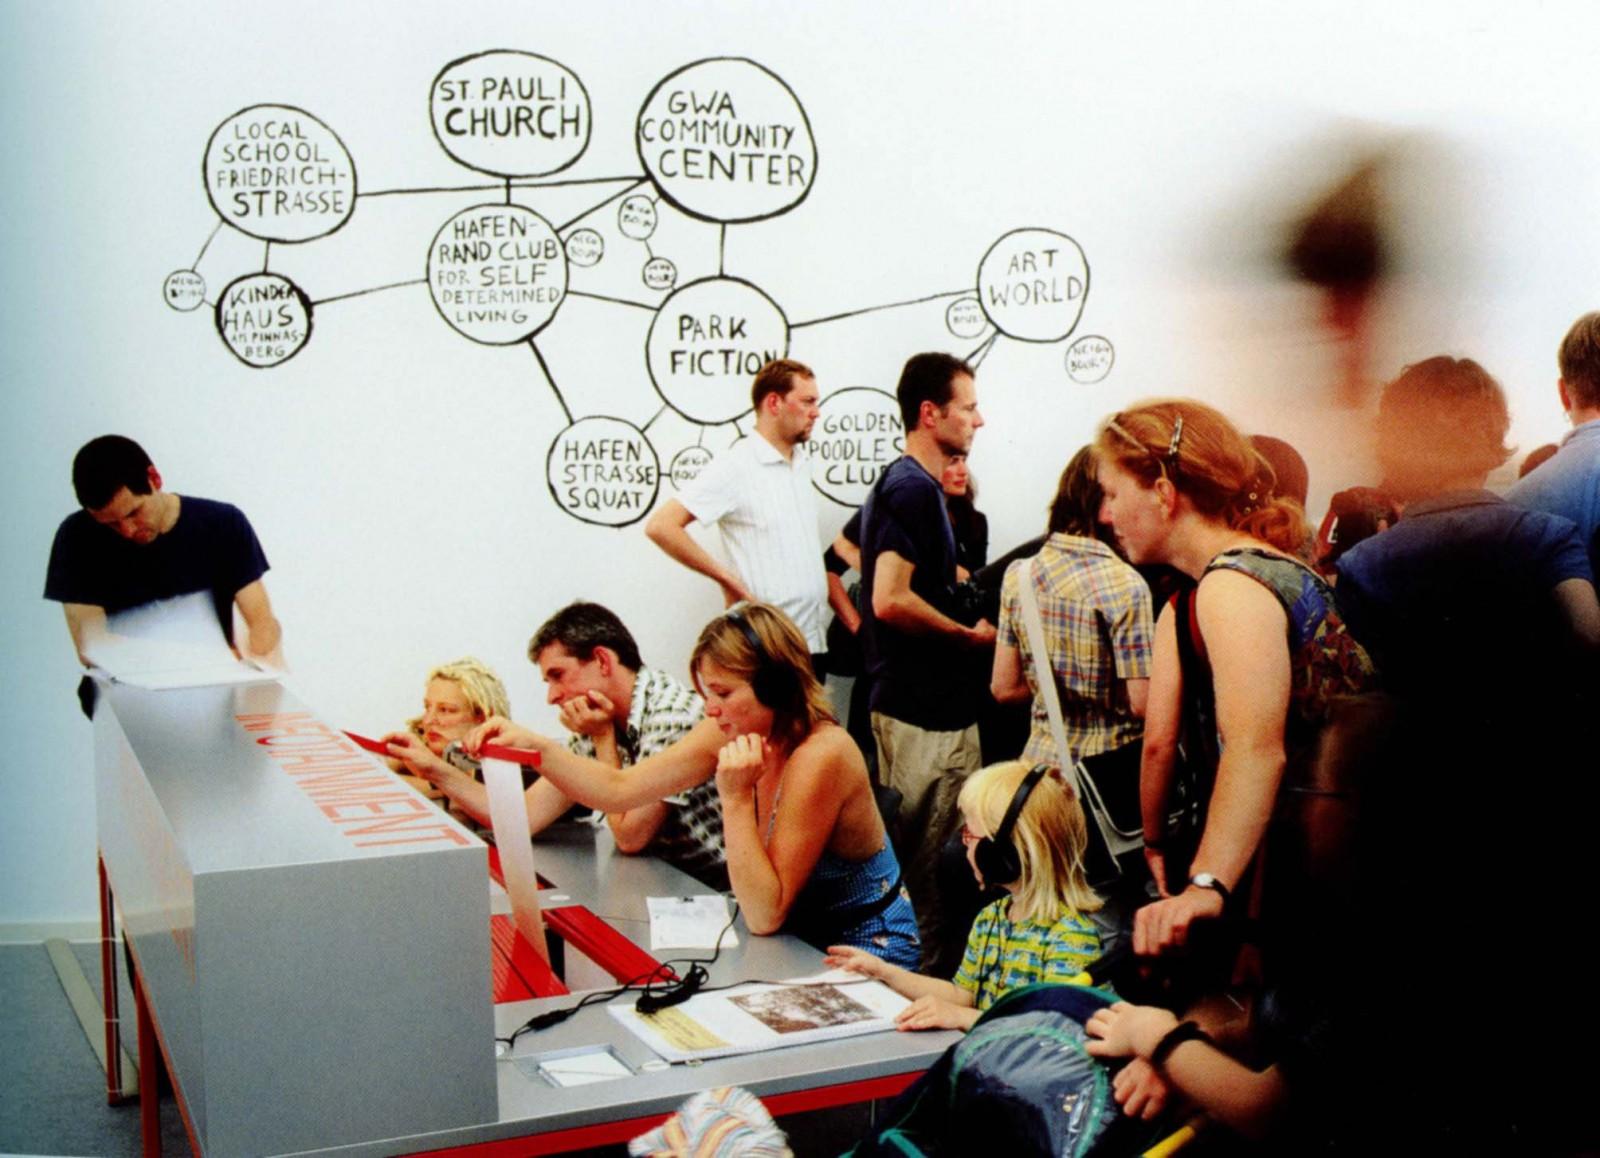 Park fiction documenta11 installation